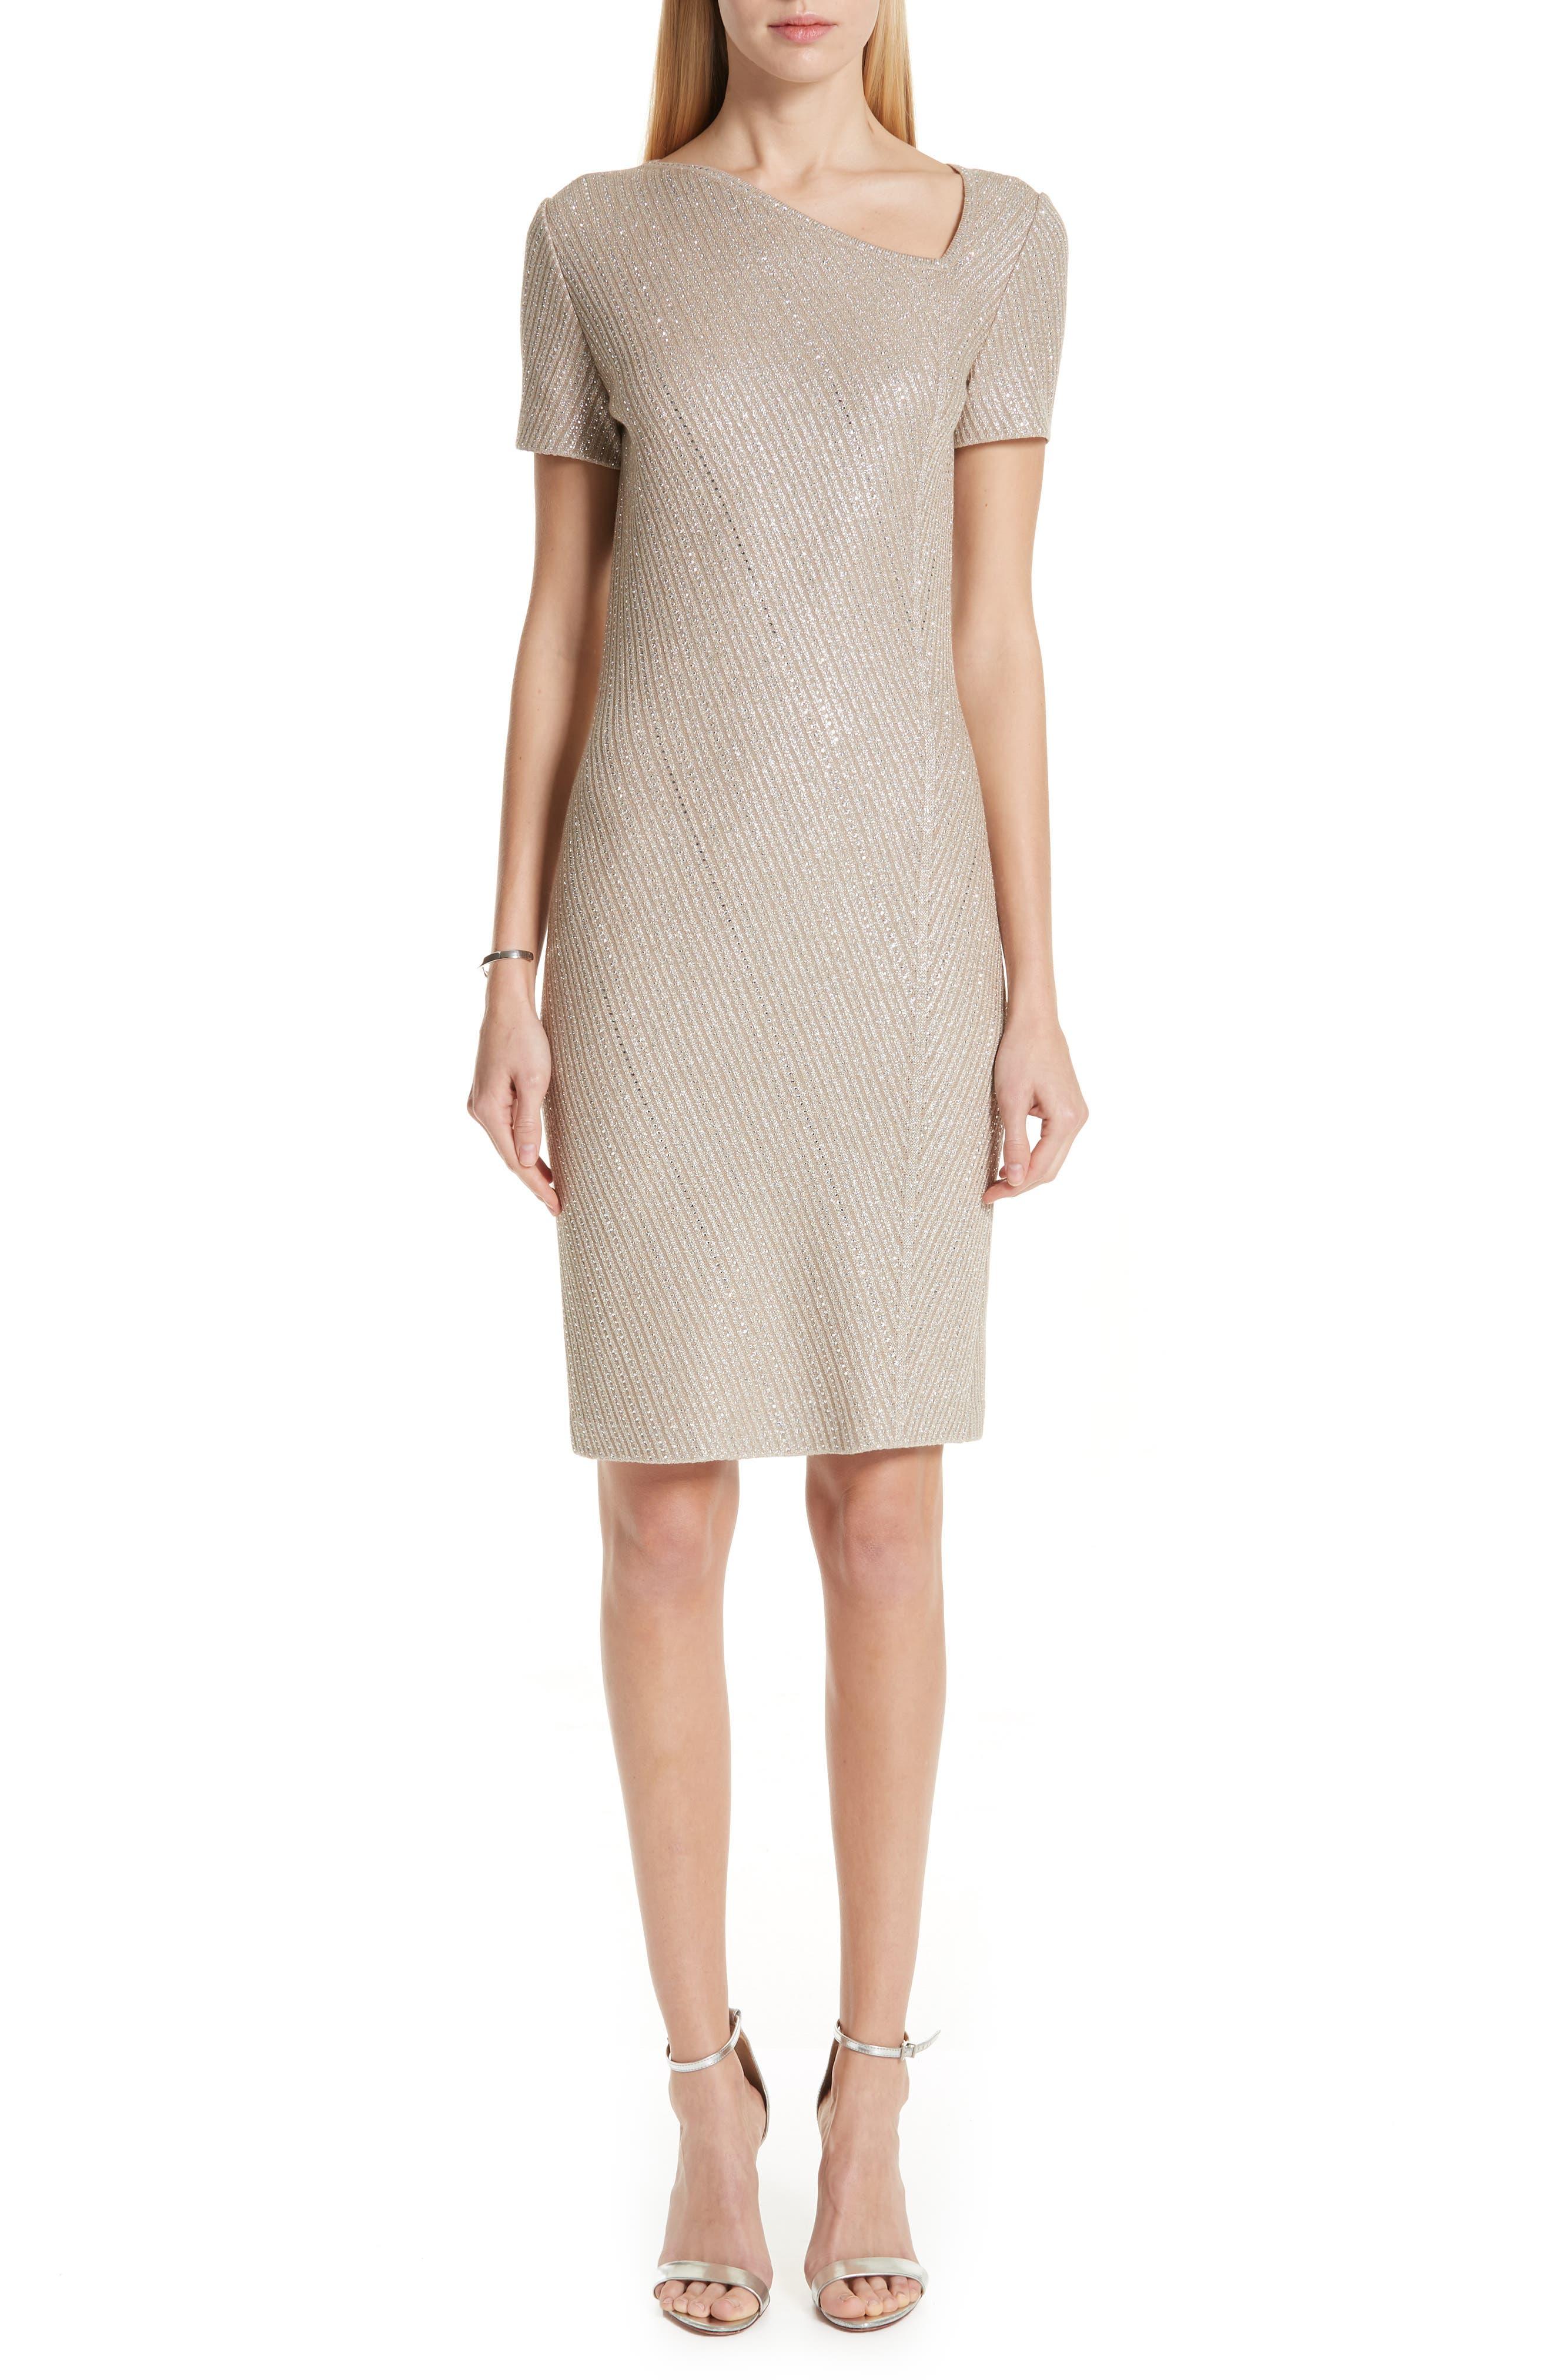 St. John Collection Brielle Knit Asymmetrical Neck Dress, Beige